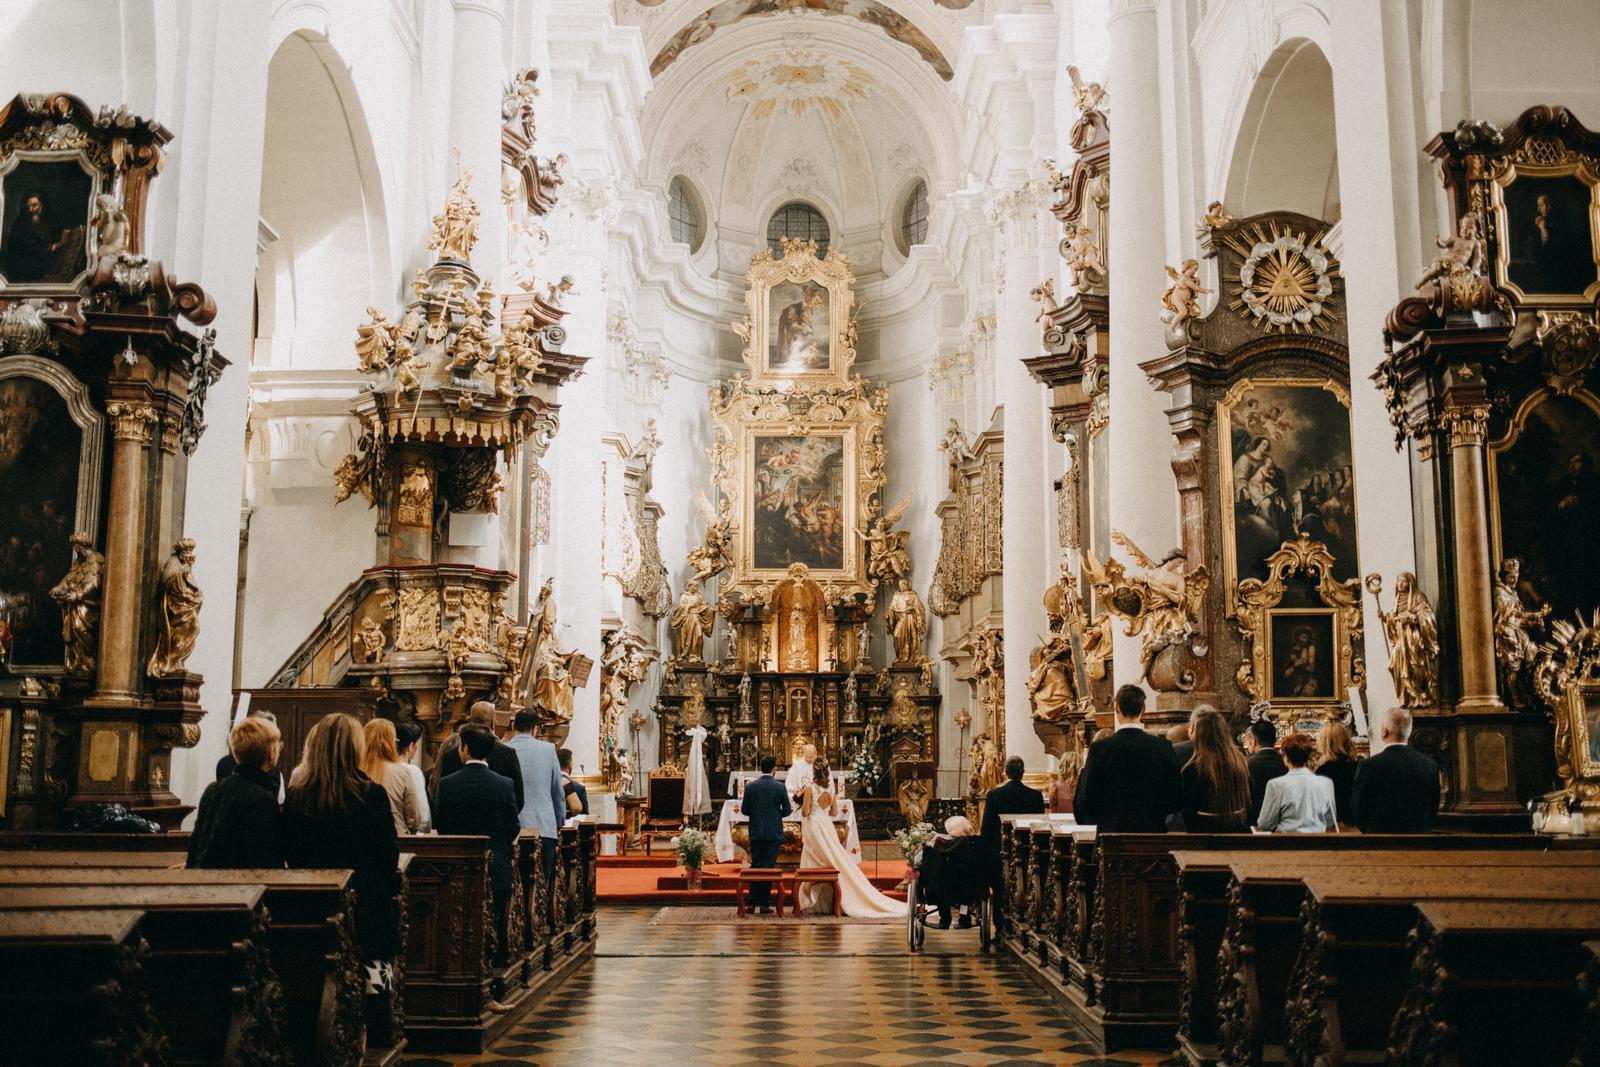 Bara & Bechara | Praha - Obrázek č. 4